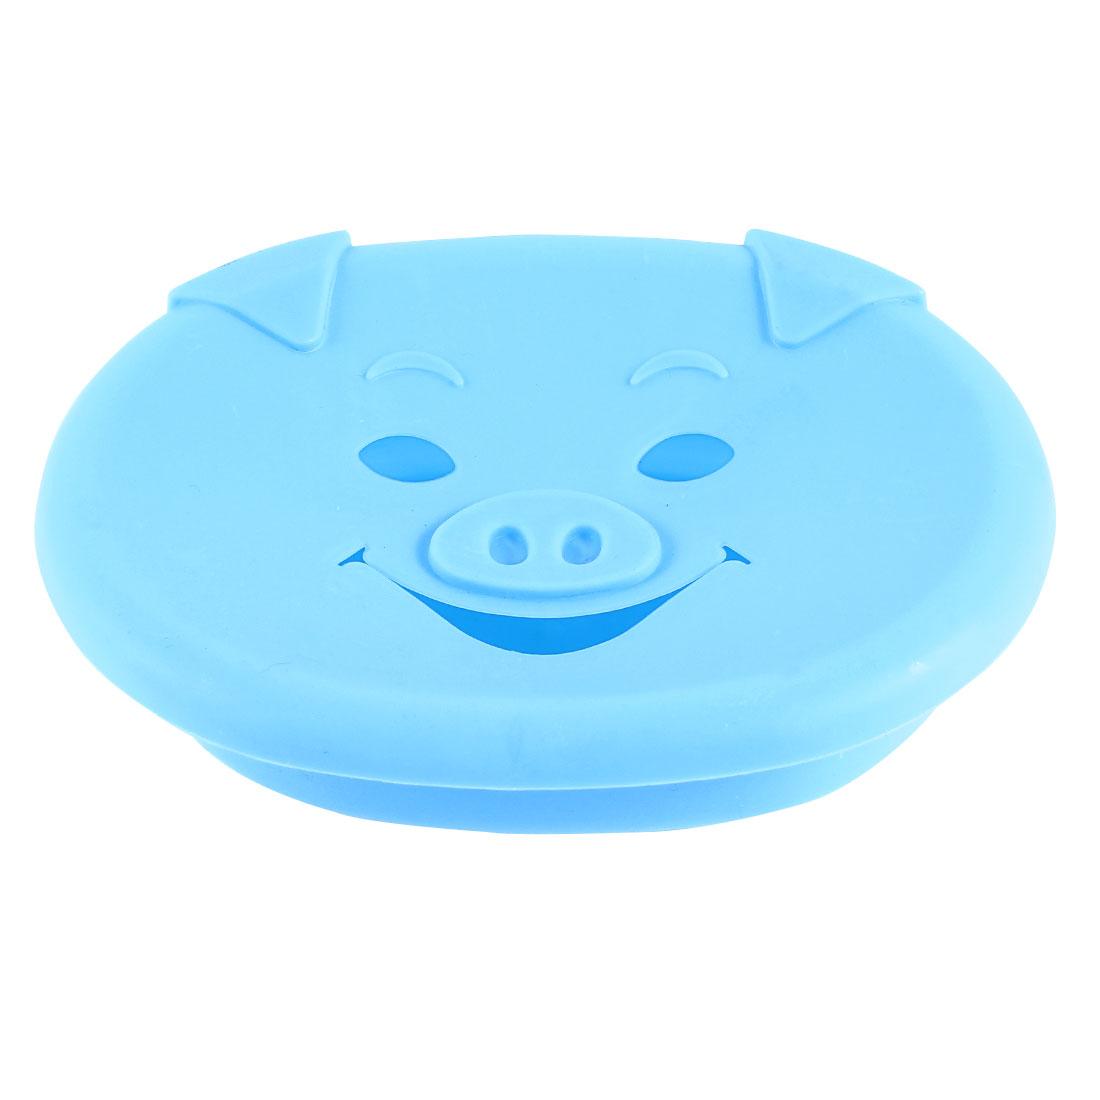 Bathroom Blue Lovely Pig Design Plastic Oval Case Soap Dish Box Holder